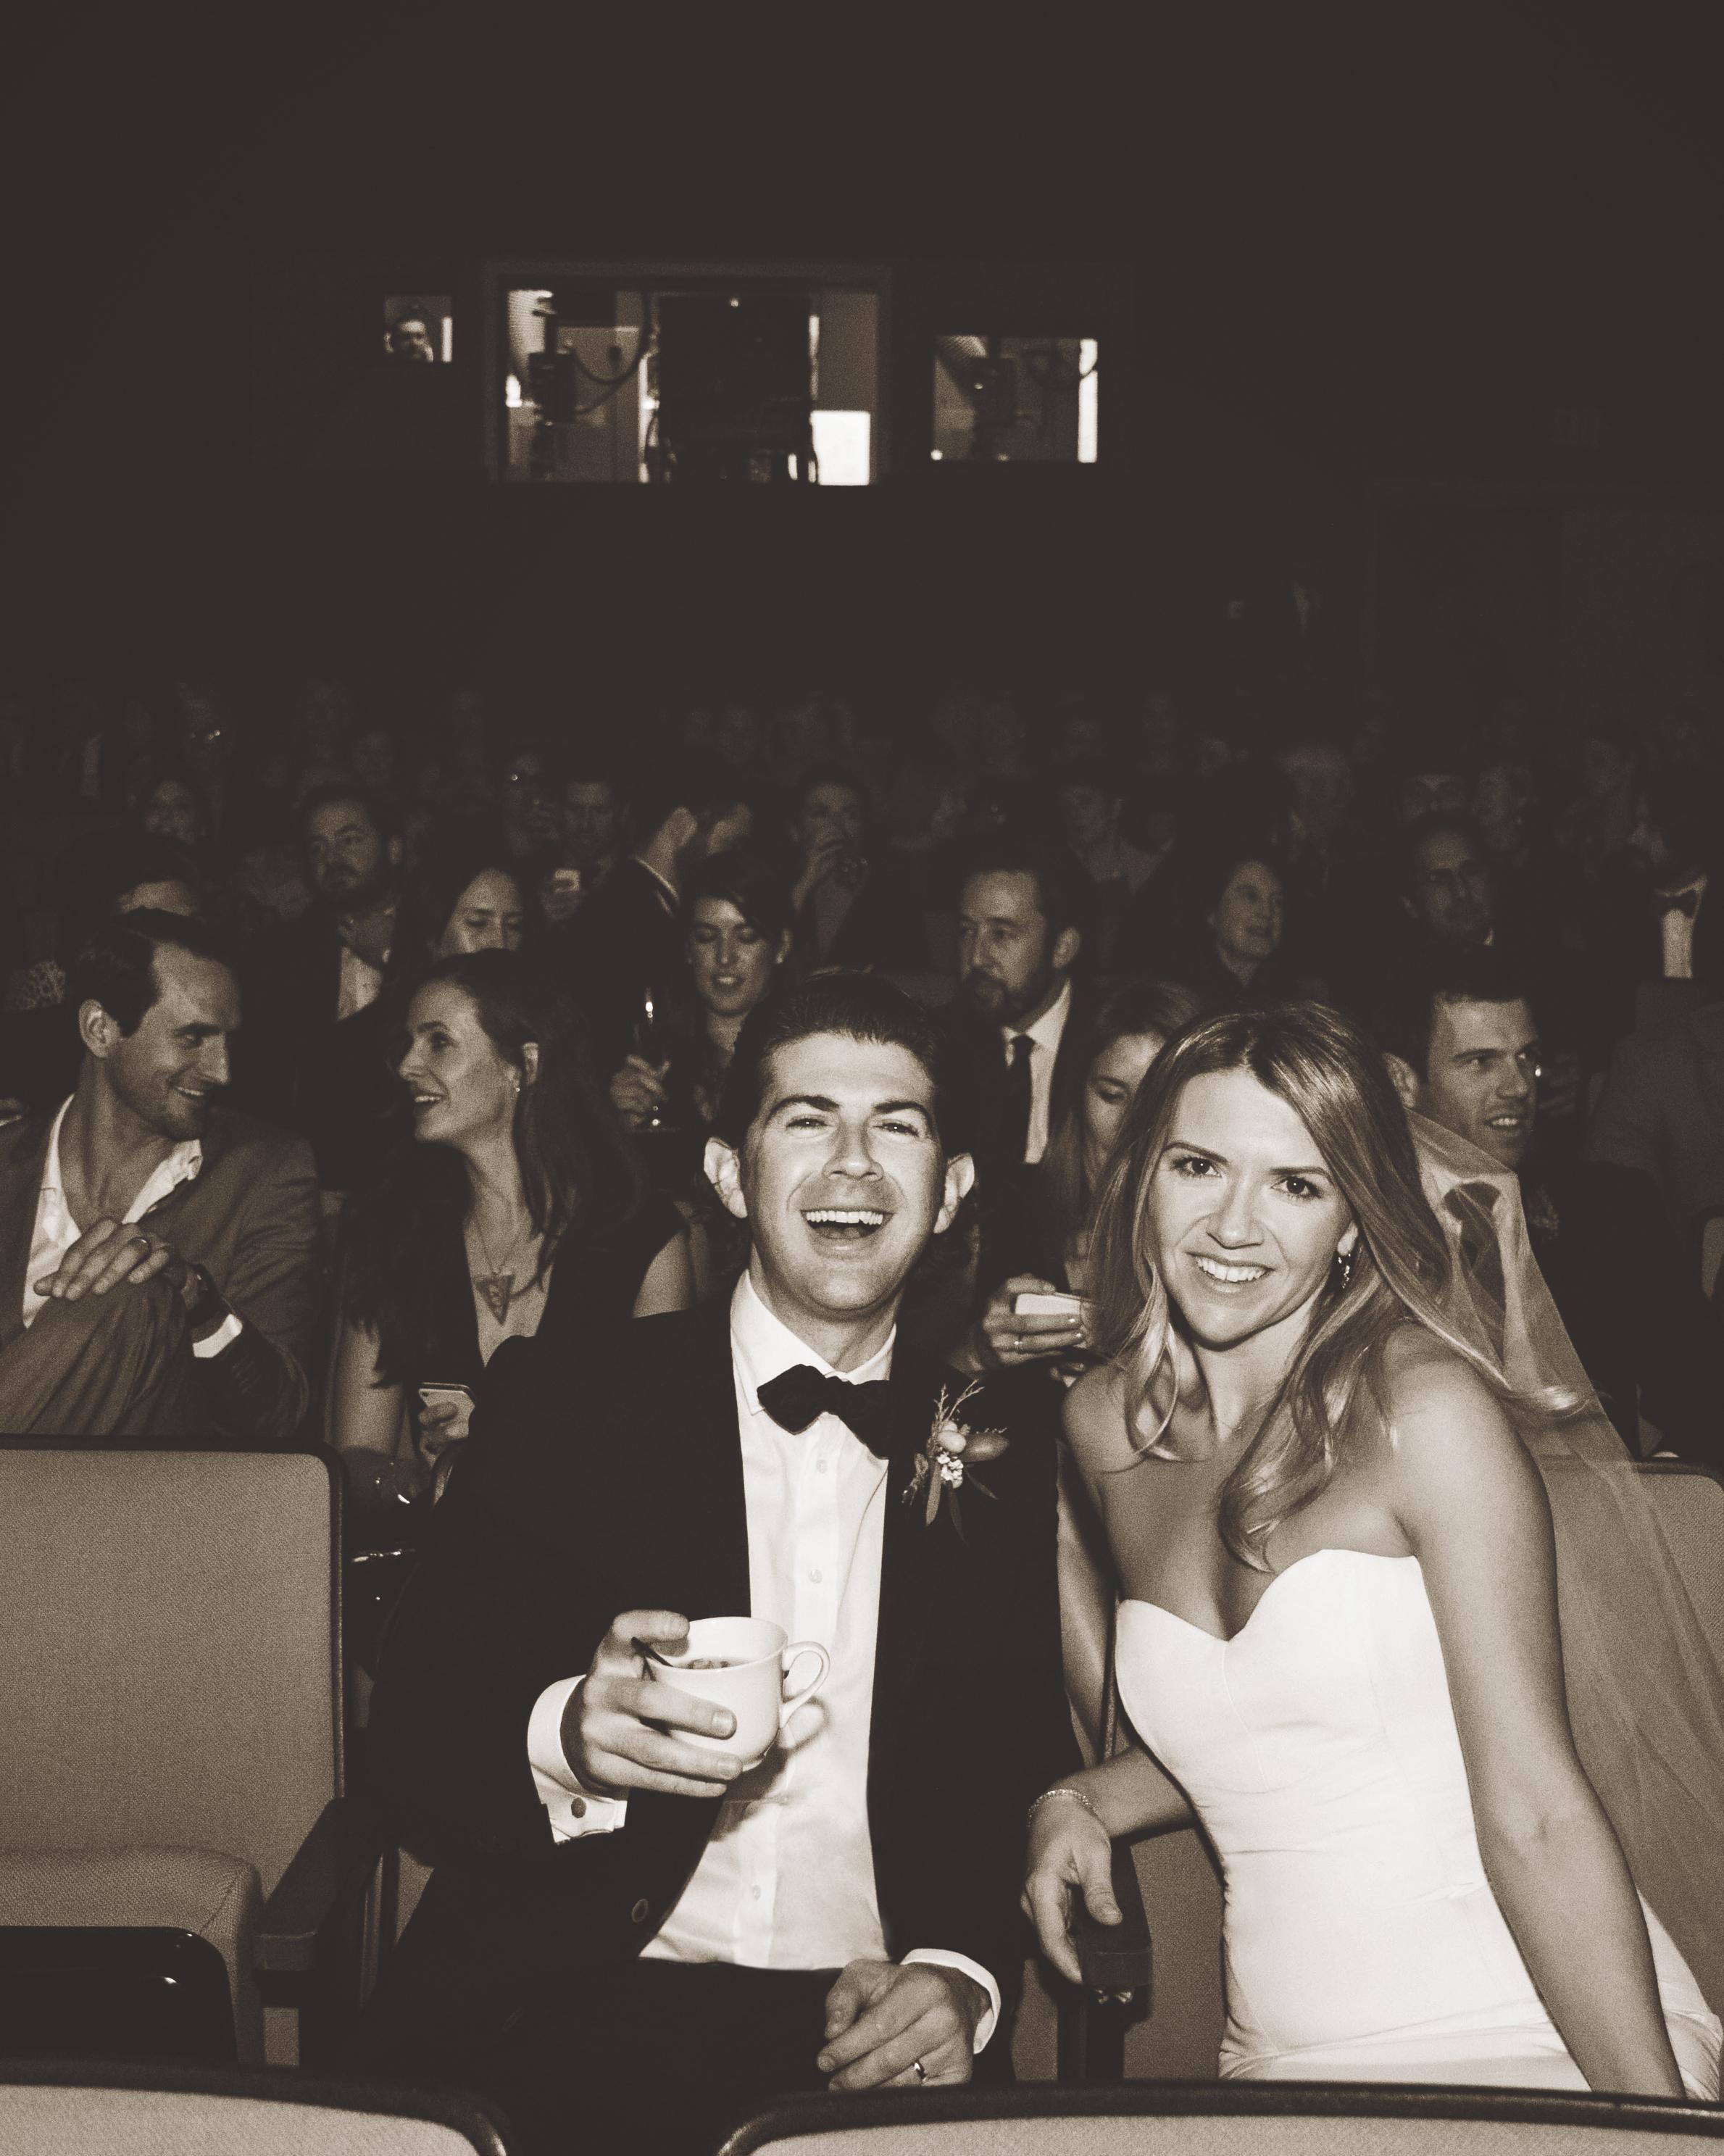 real-wedding-whitney-jordan-img-1321-ds111145-bw.jpg